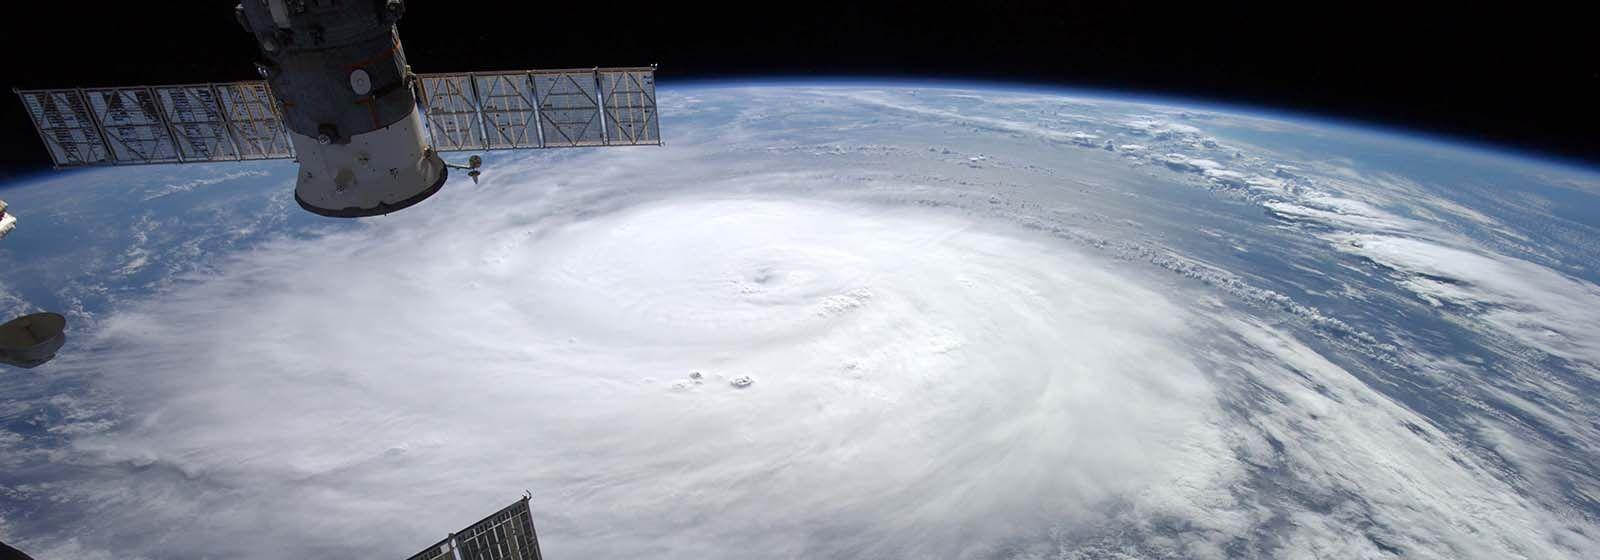 Hurricane season kept meteorologists busy this year